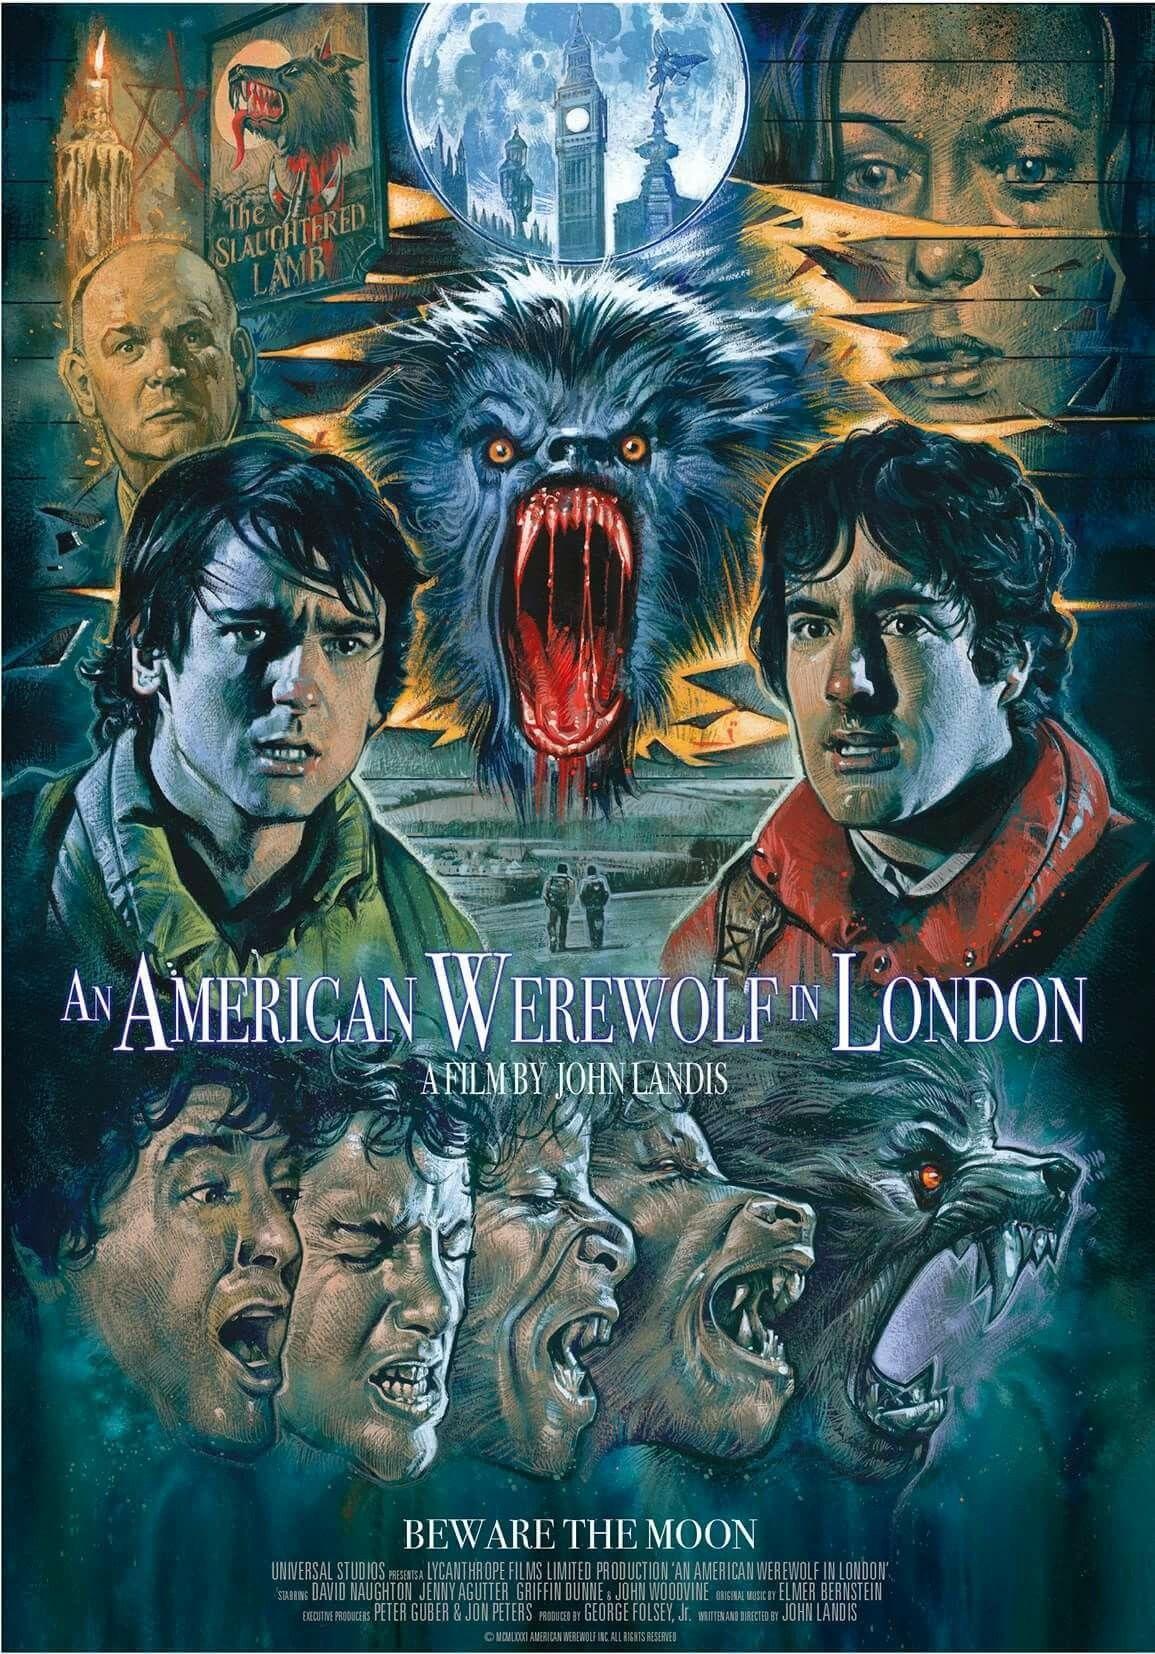 fantastic artwork of the horror classic film an american werewolf in